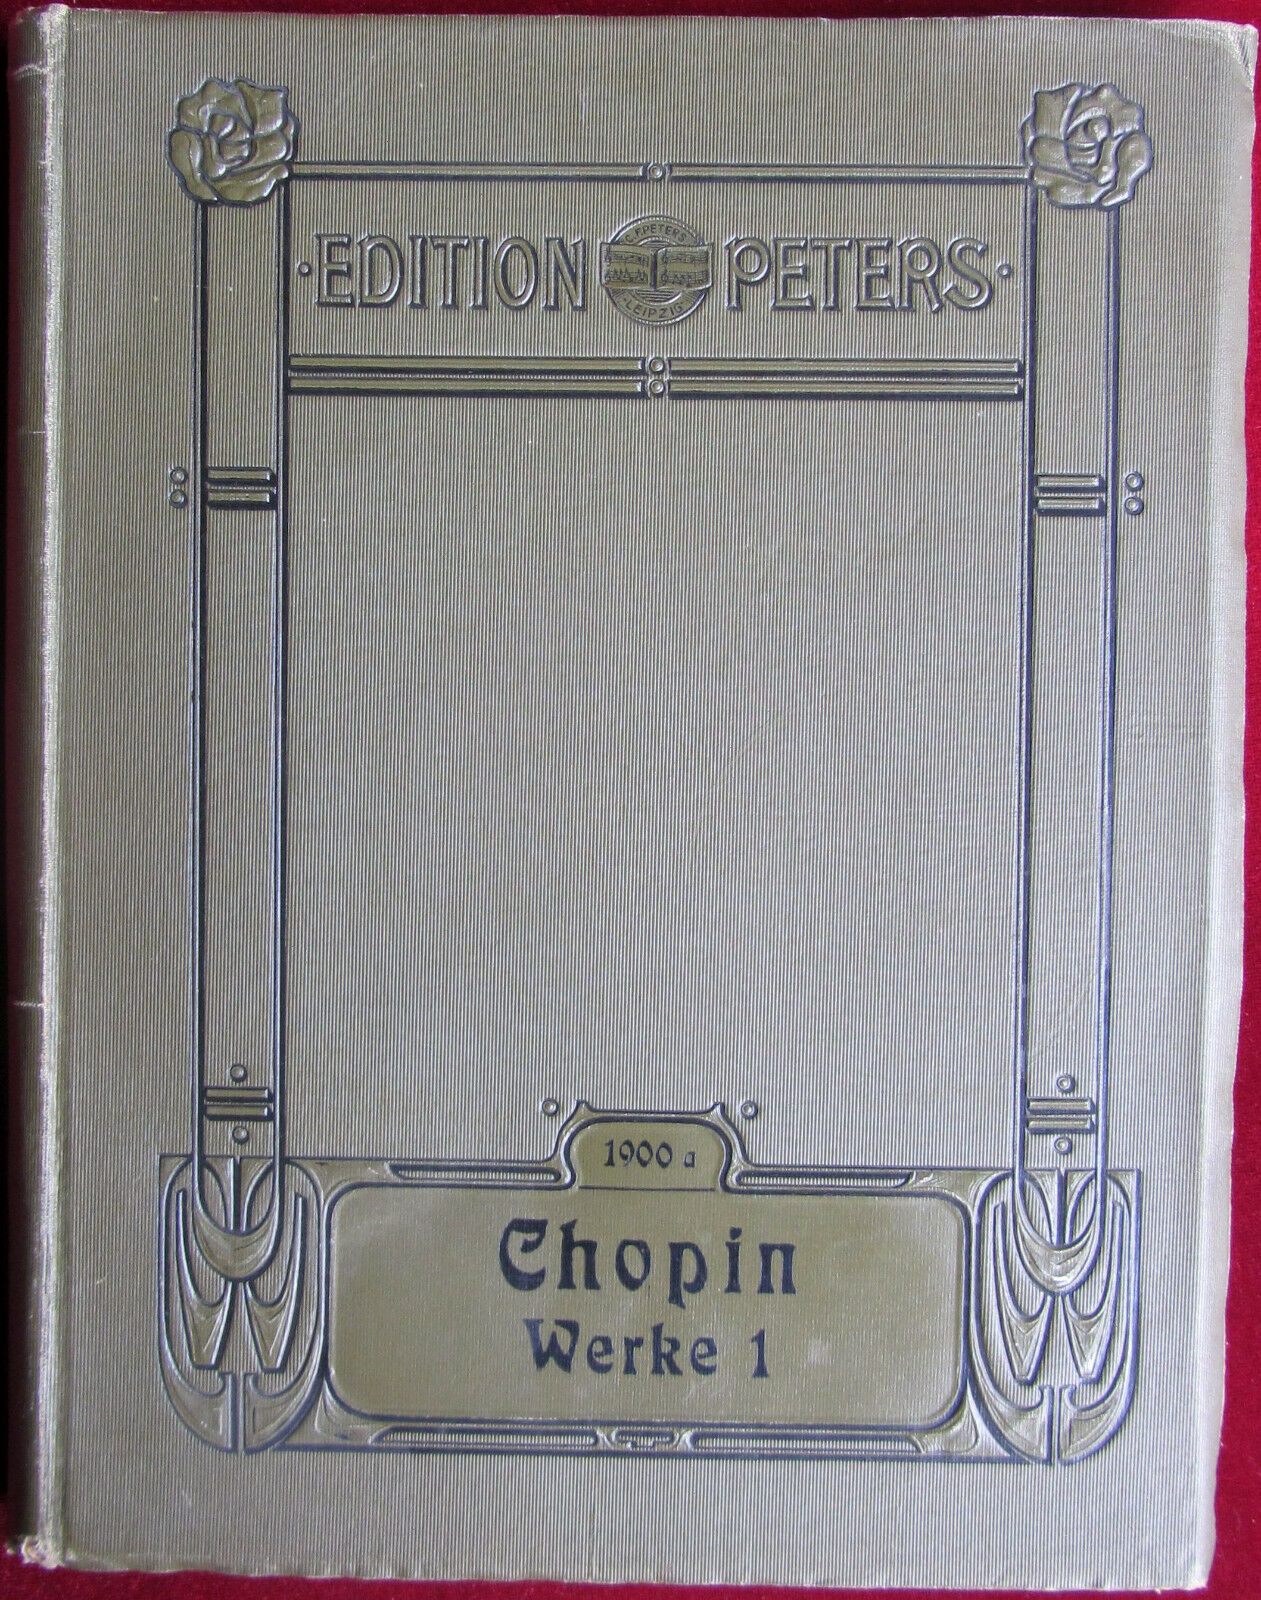 Edition Peters 1900a: Chopin. Werke 1